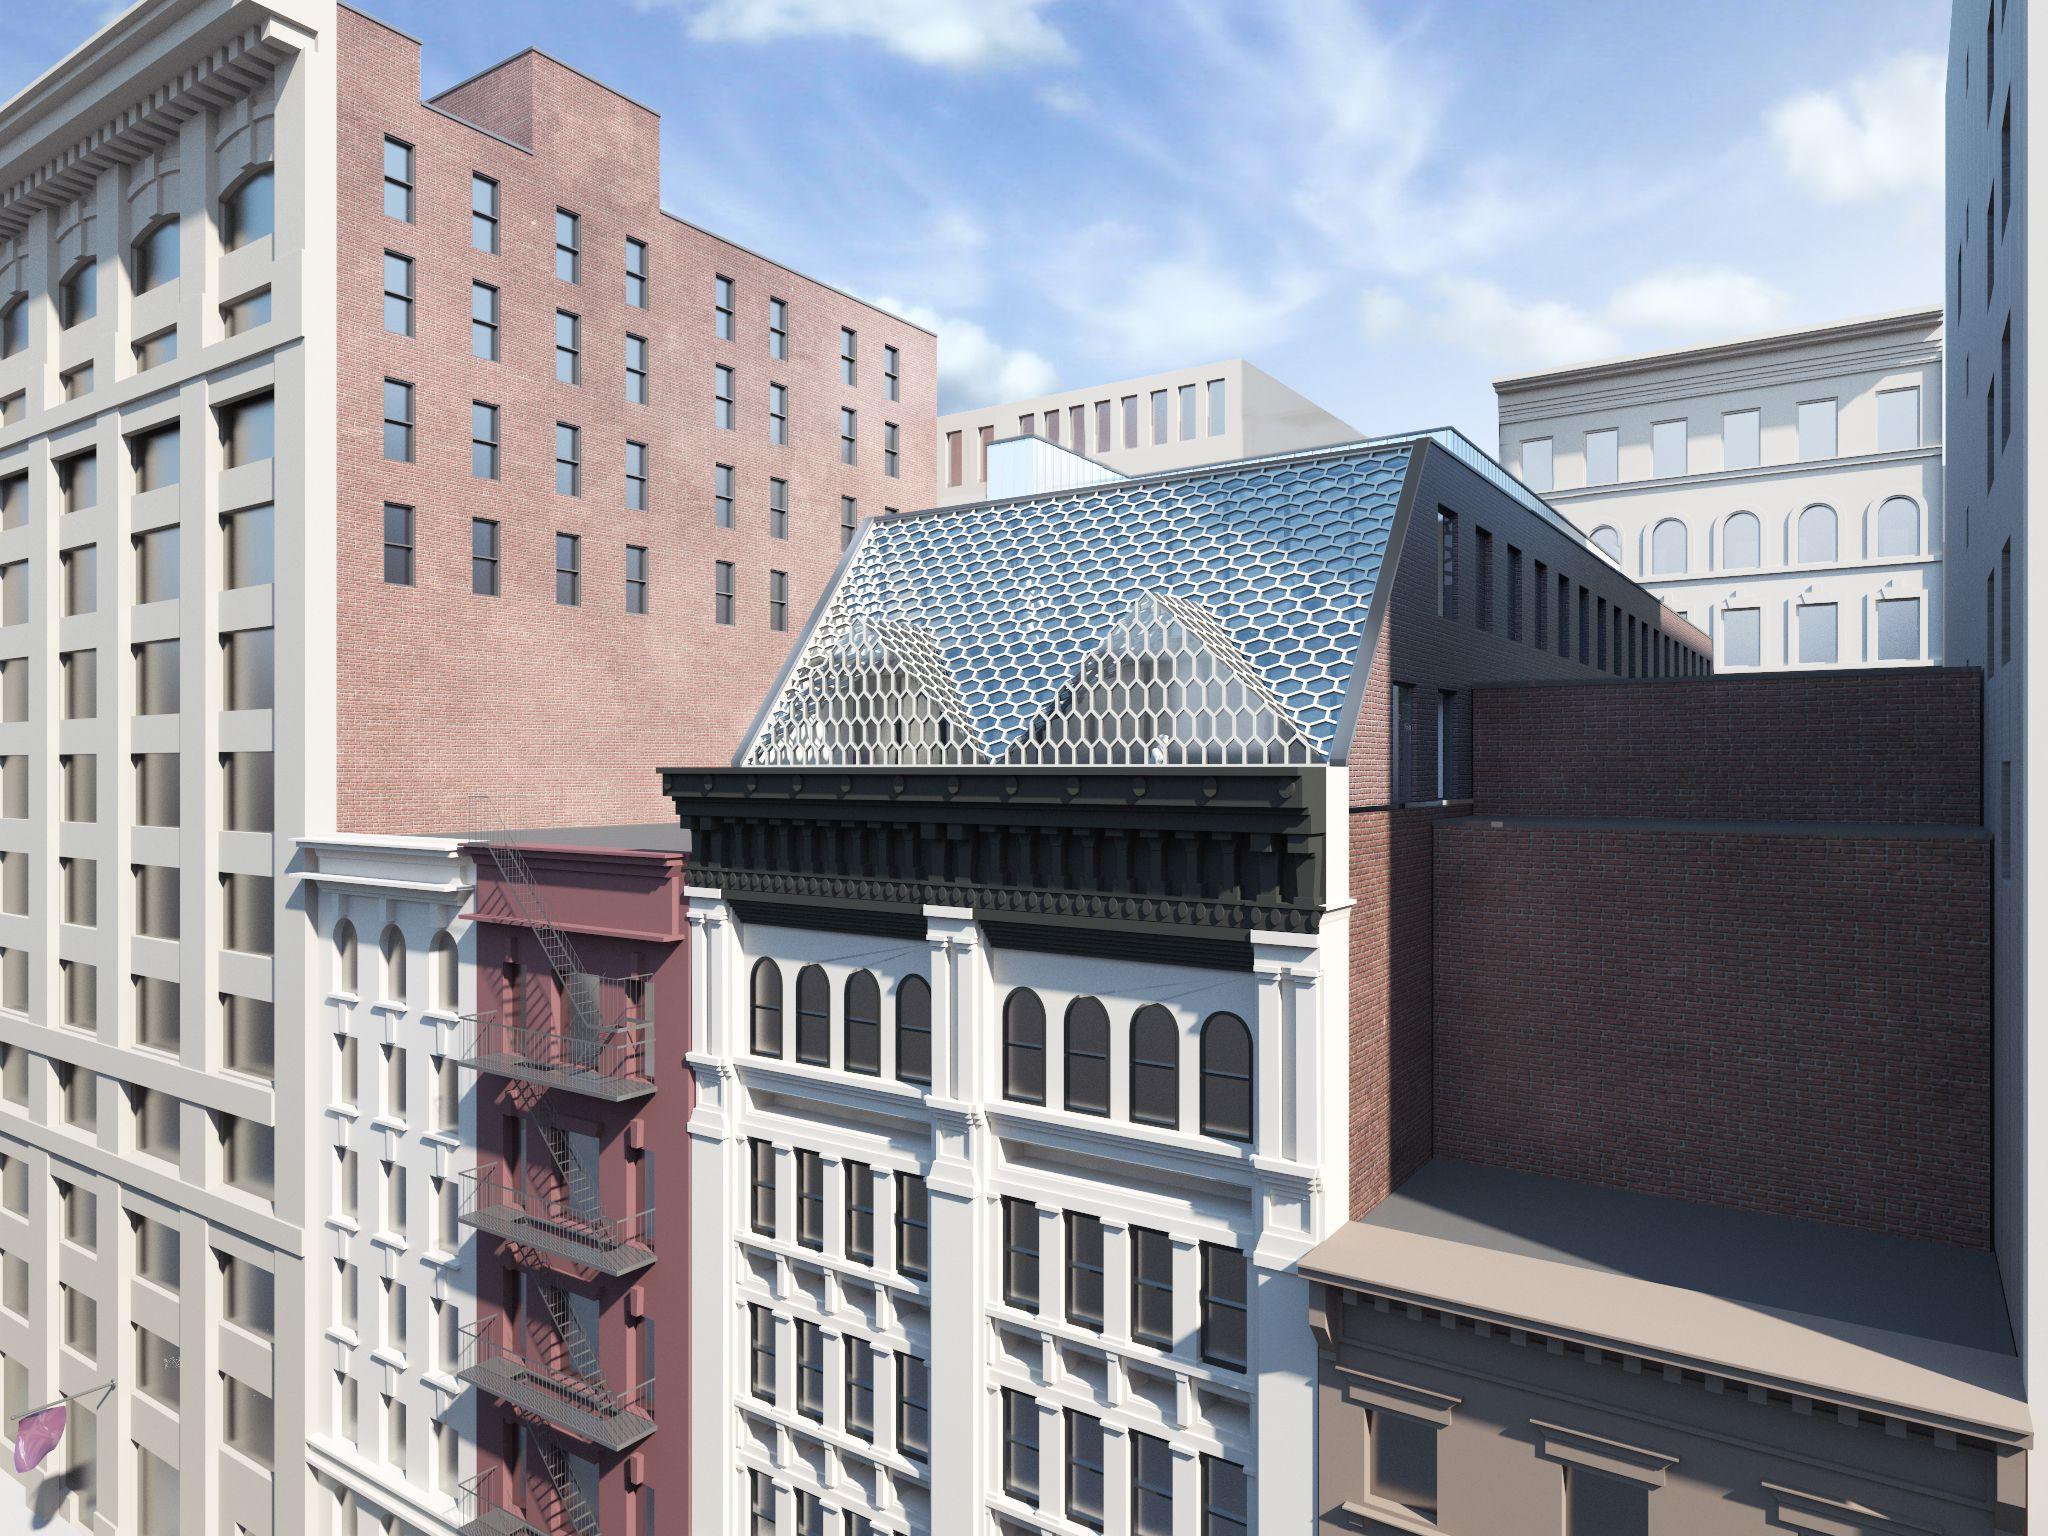 westminster roof extensions google search nadbudowa. Black Bedroom Furniture Sets. Home Design Ideas